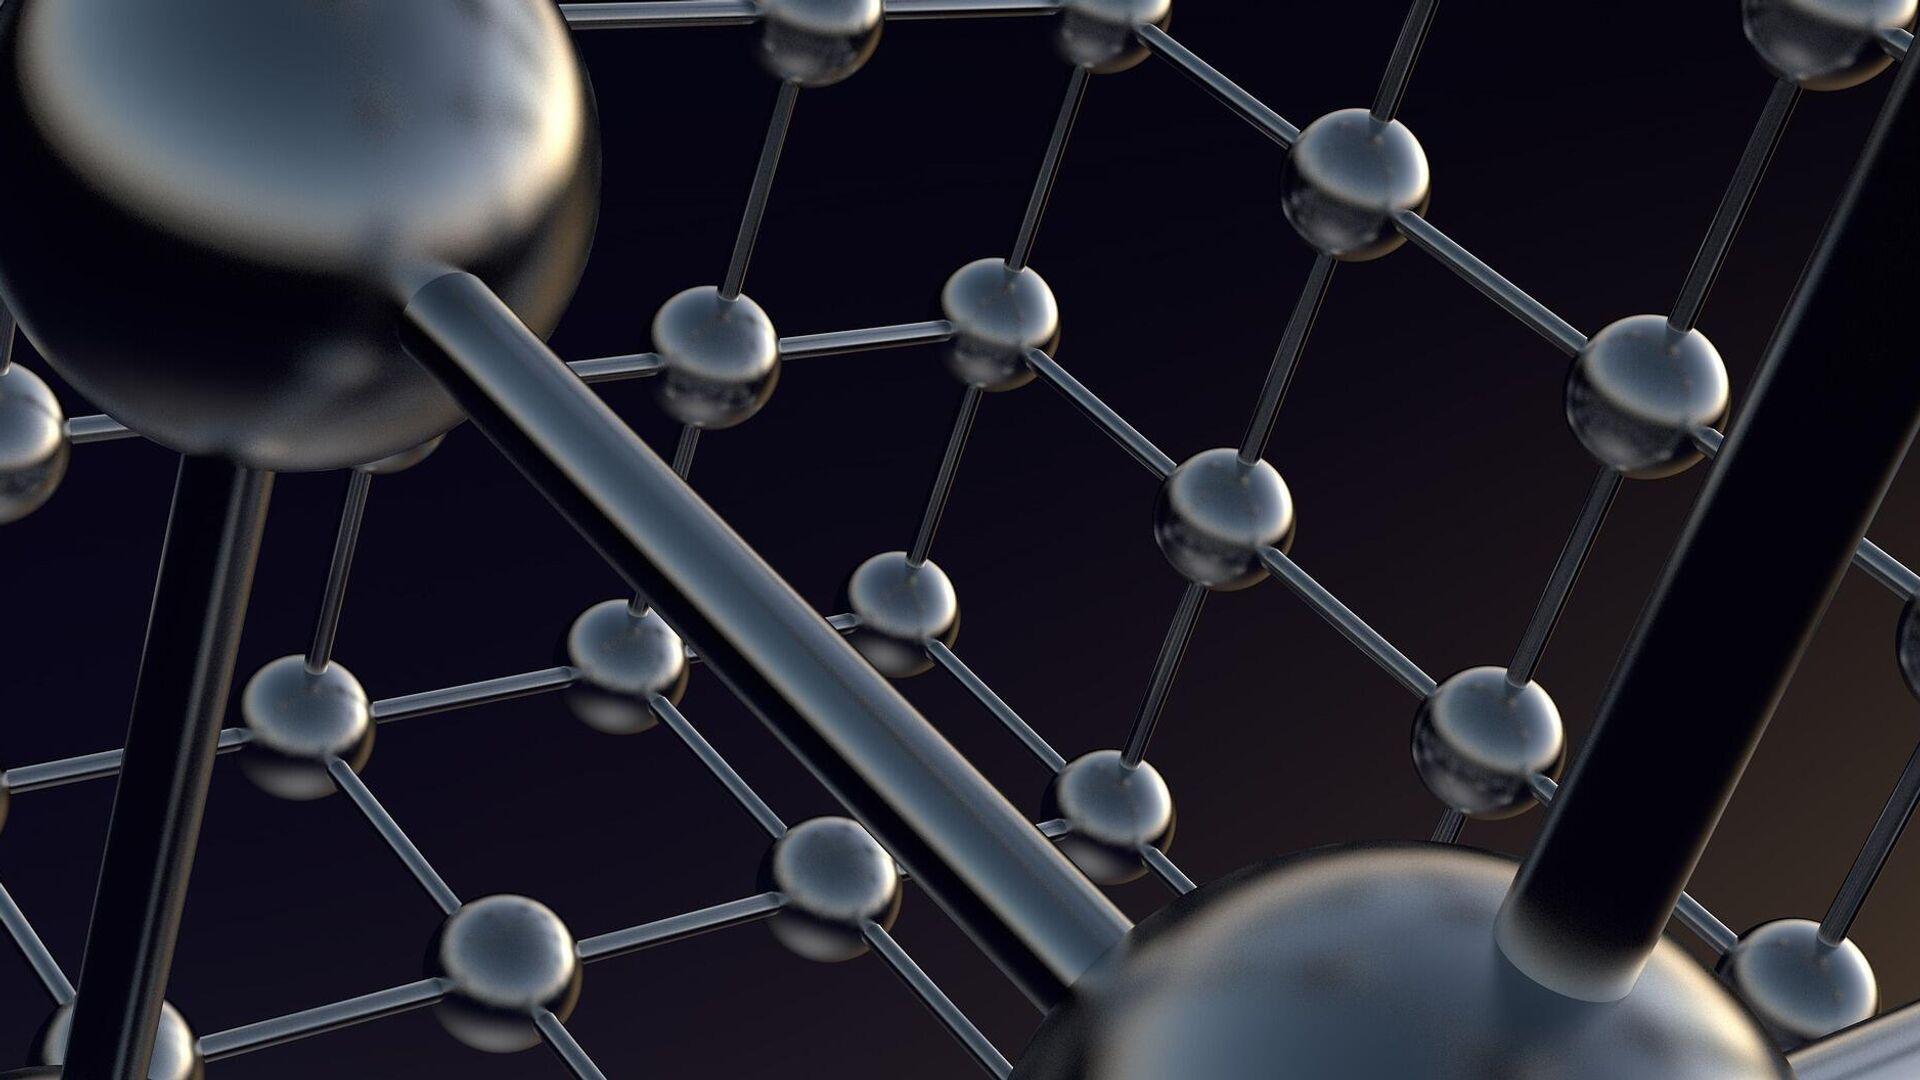 Atom (Symbolbild) - SNA, 1920, 11.07.2021